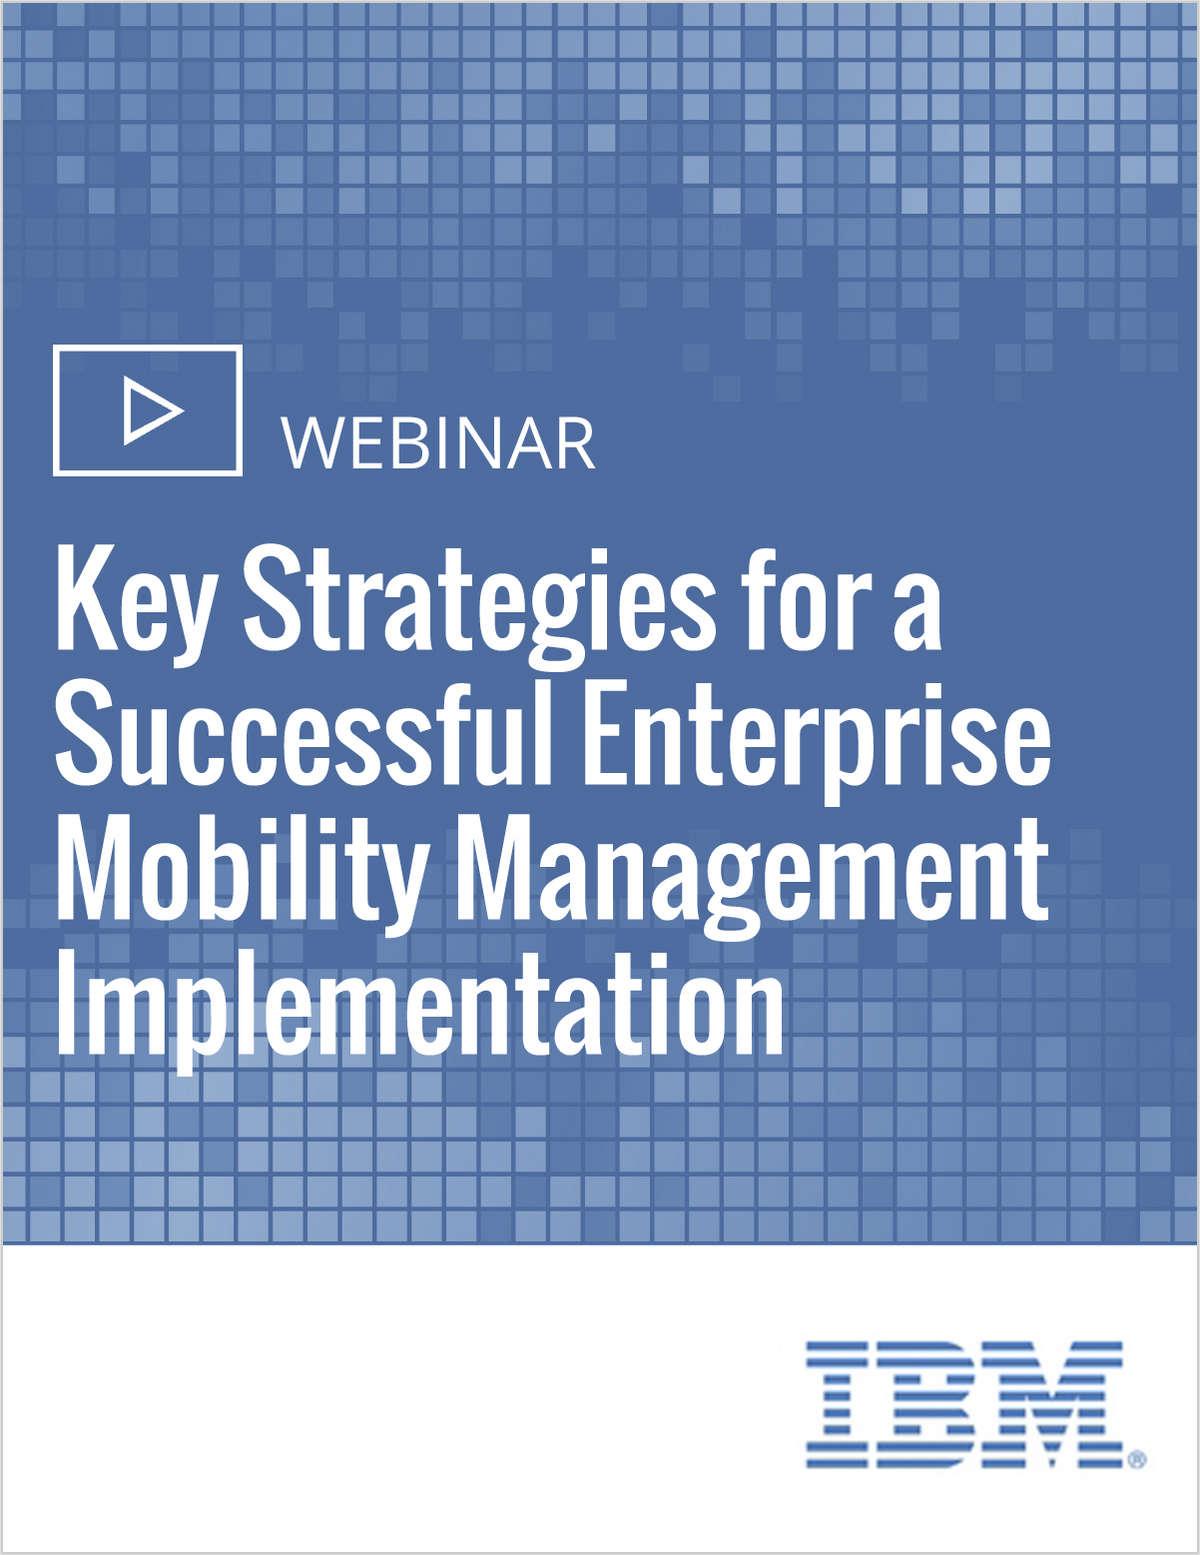 Key Strategies for a Successful Enterprise Mobility Management Implementation